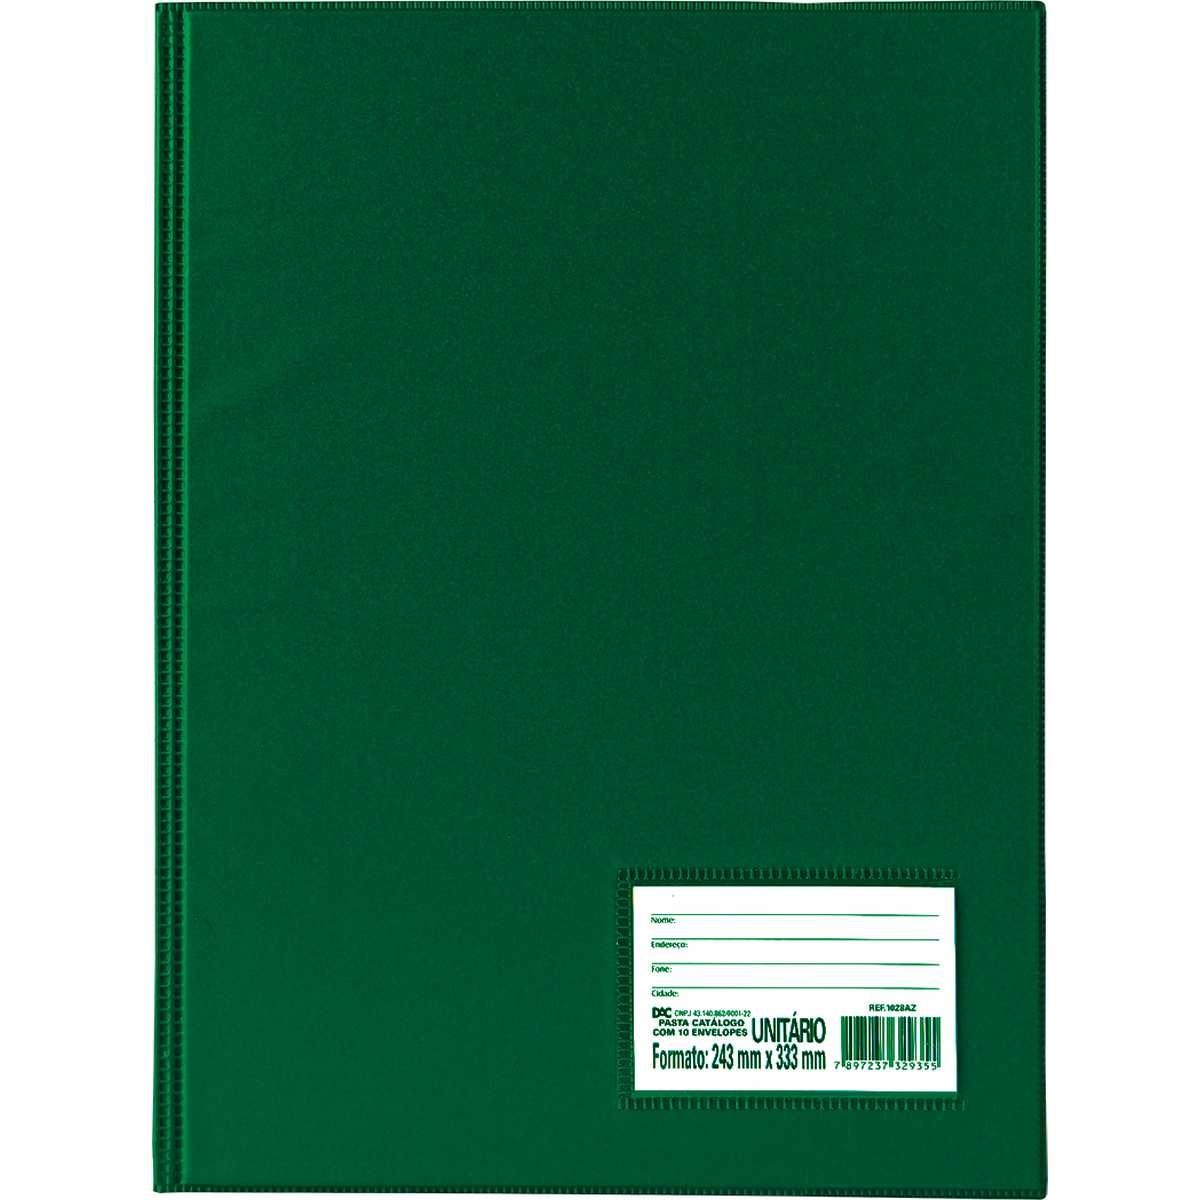 Pasta Catalogo - Oficio c/50 Envelopes Finos Verde - Dac